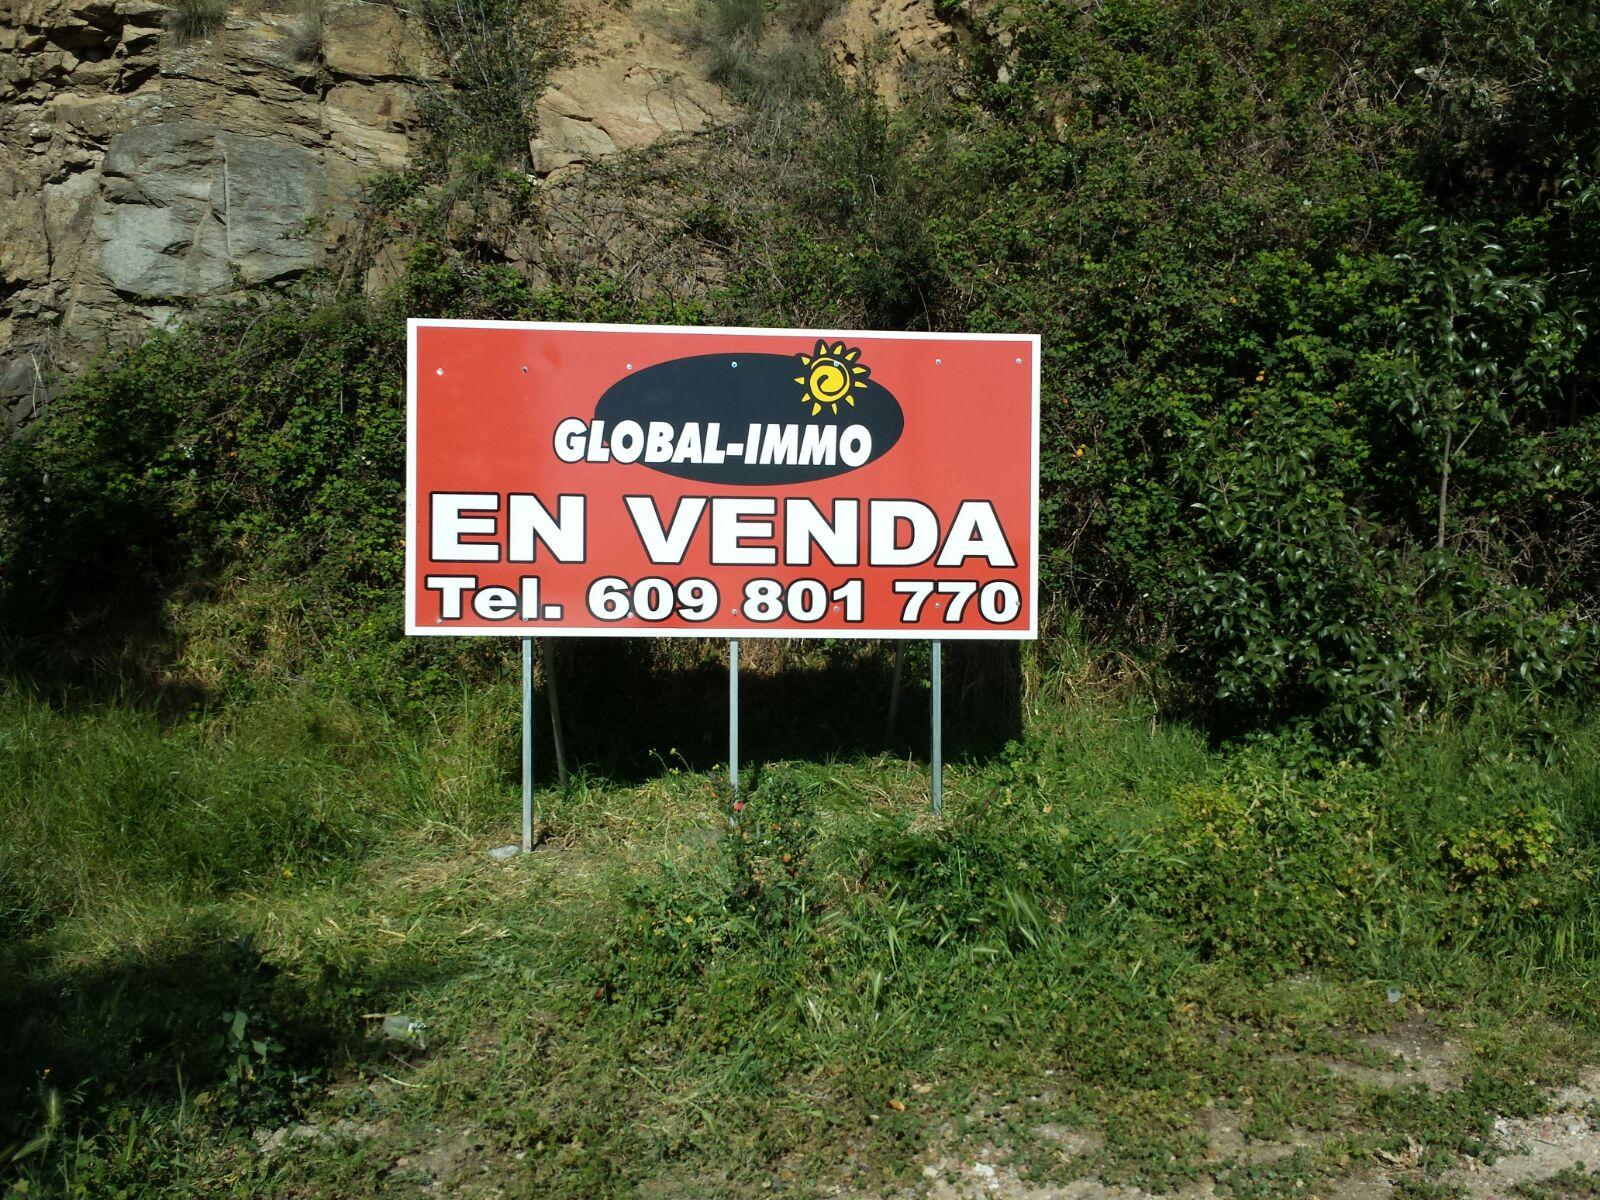 GLOBALIMMO2 - Tanques Publicitàries